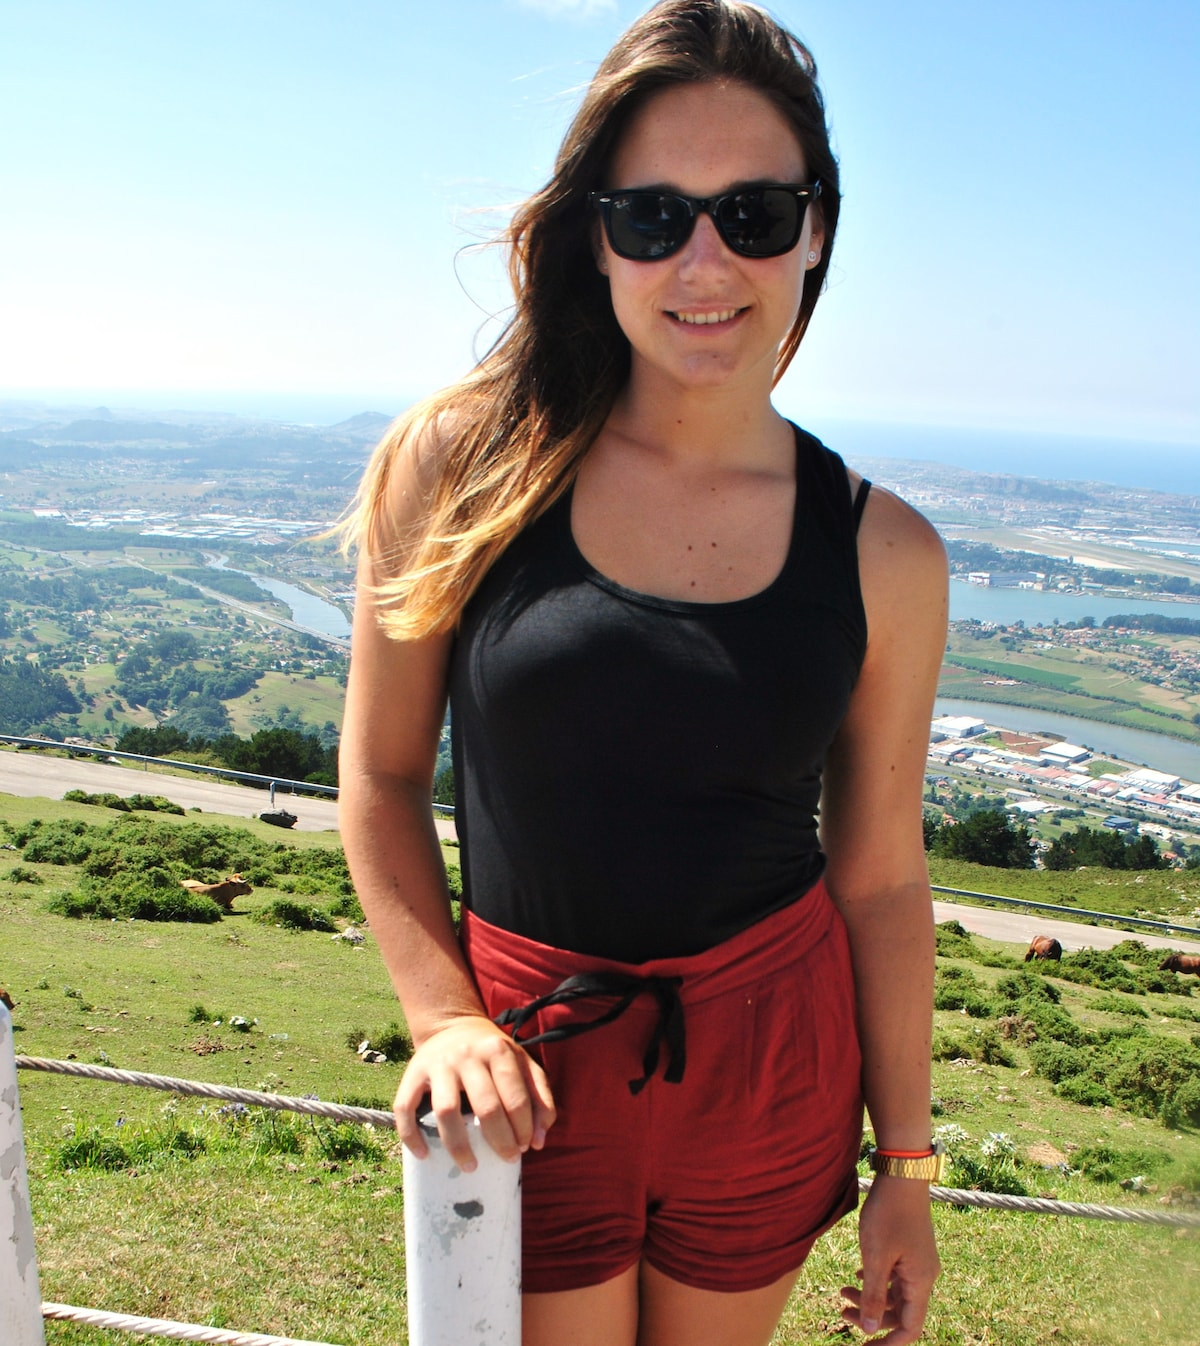 Irene from Santander